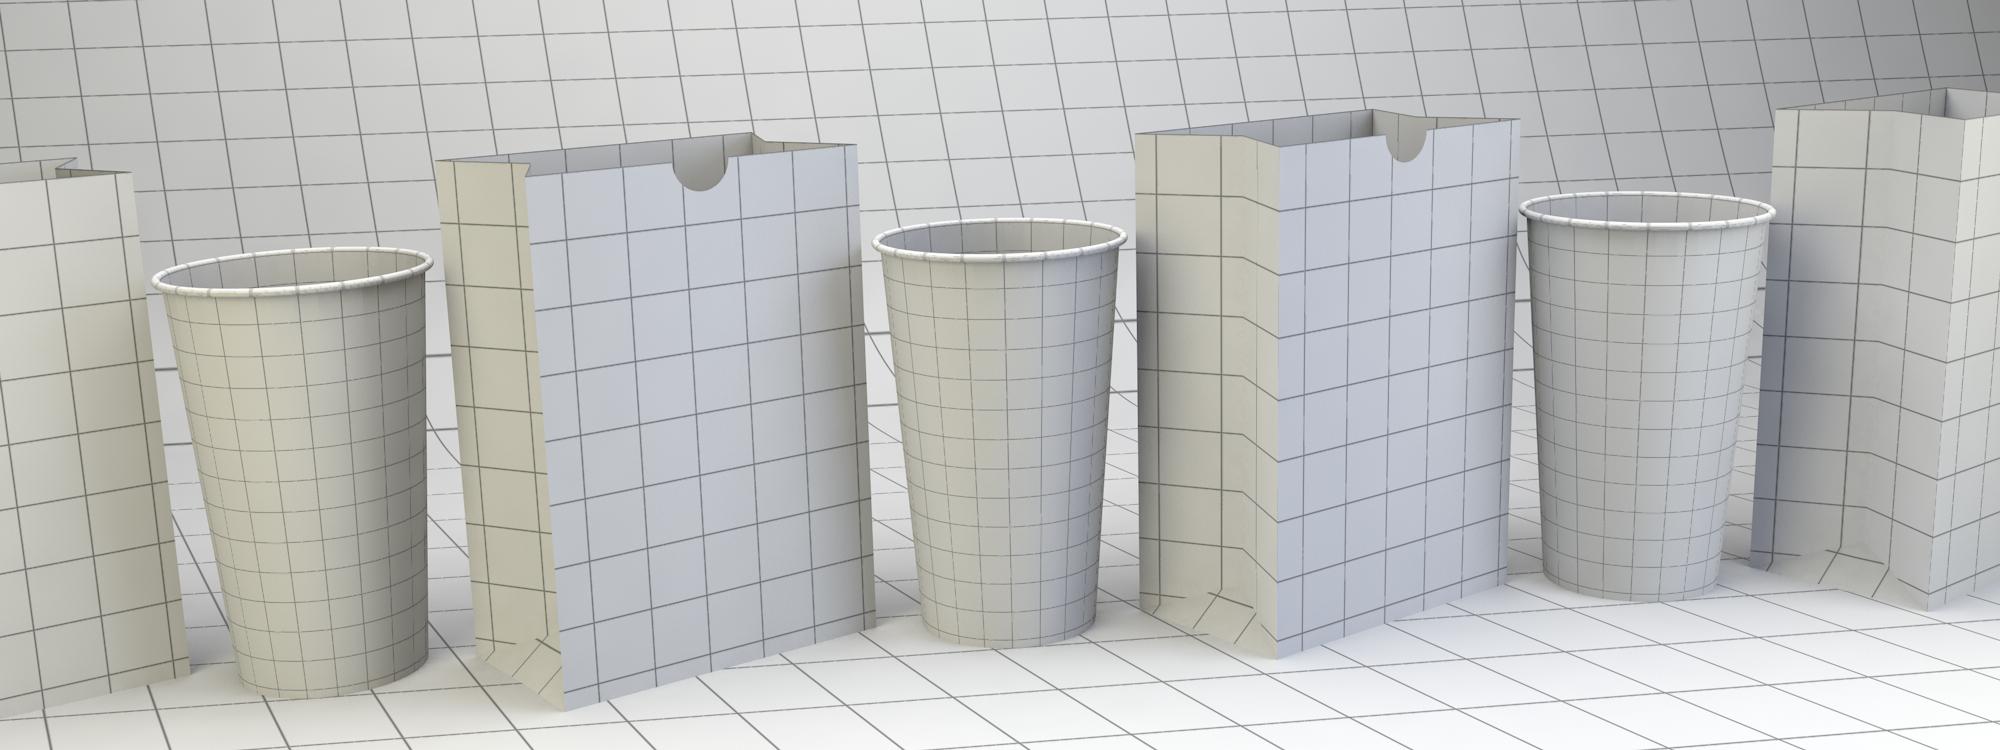 clay-cup-models